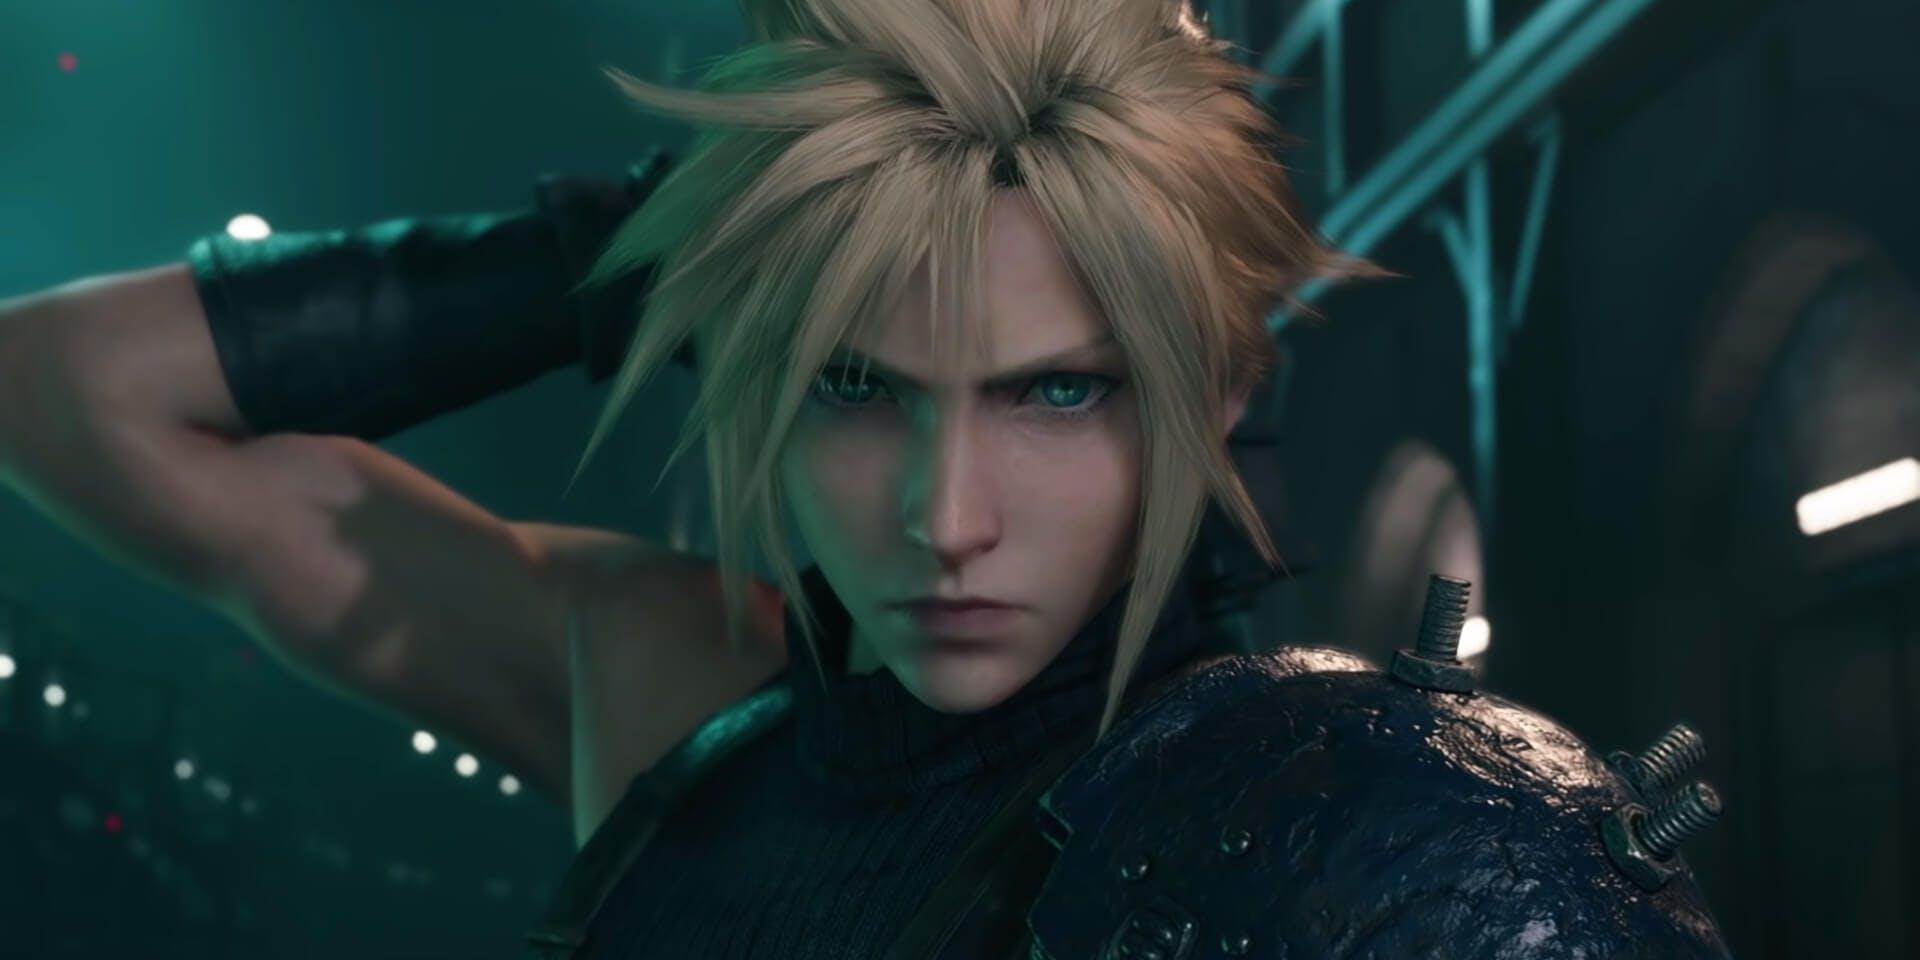 Final Fantasy 7 Remake - Cloud